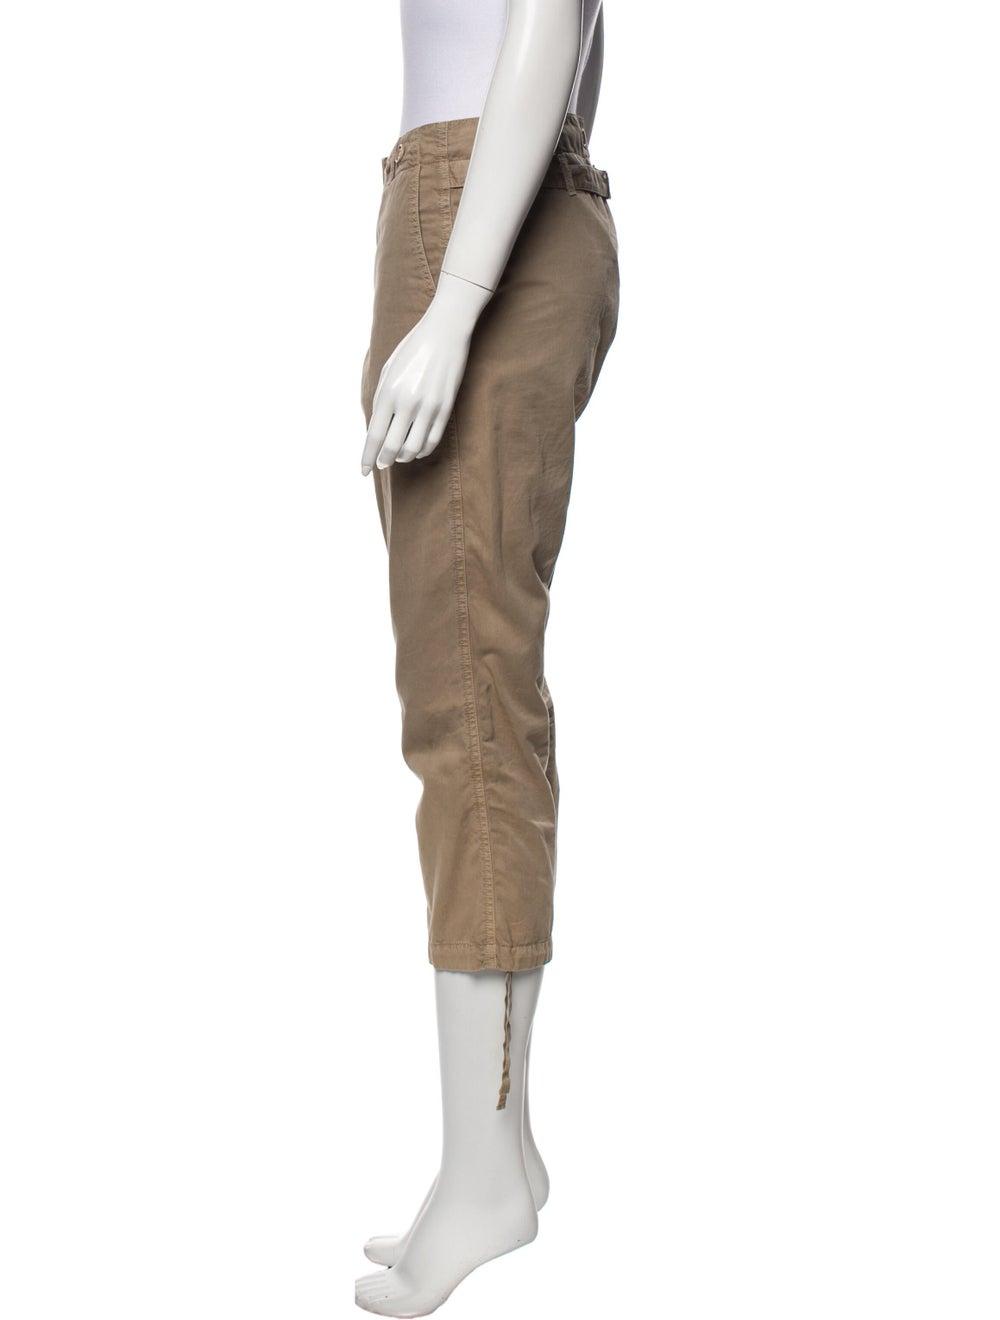 Prada Sport Straight Leg Pants - image 2